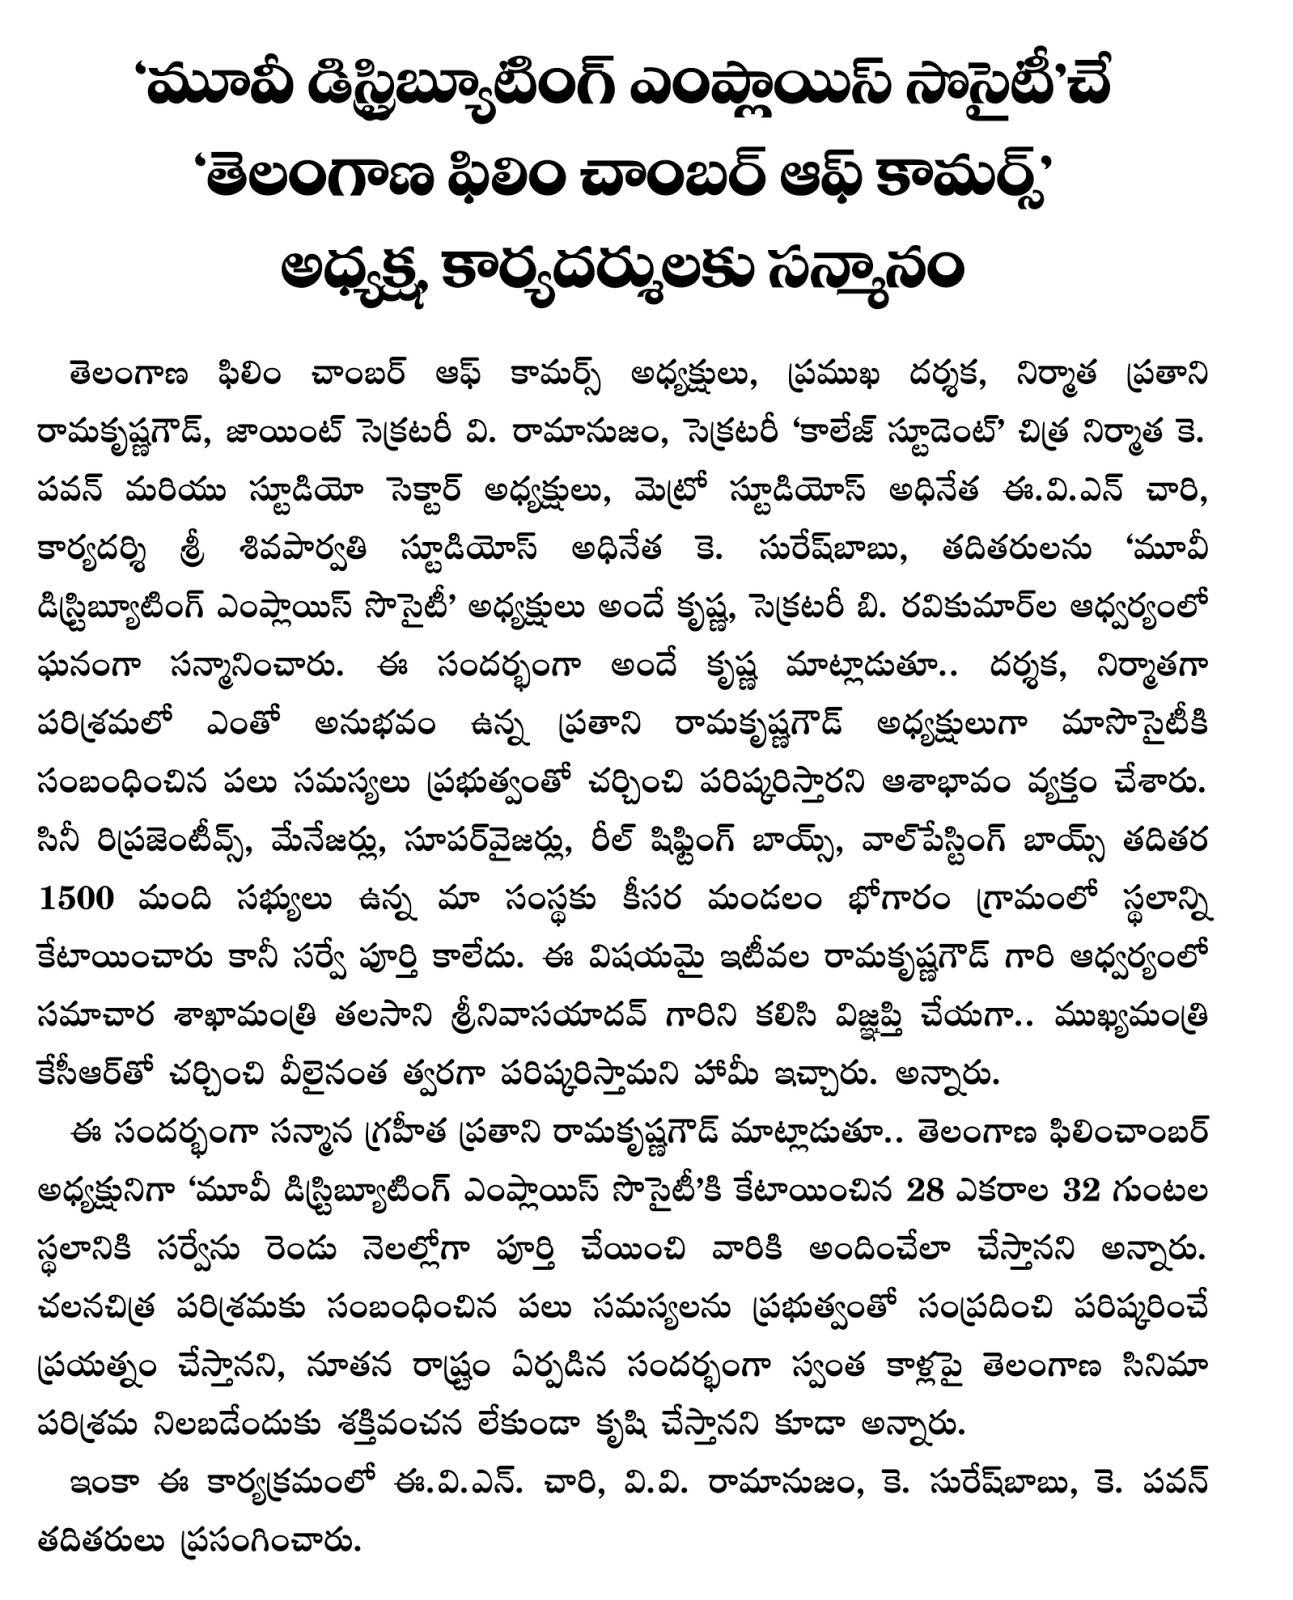 Telangana Film Chamber of Commerce Team Felicitated